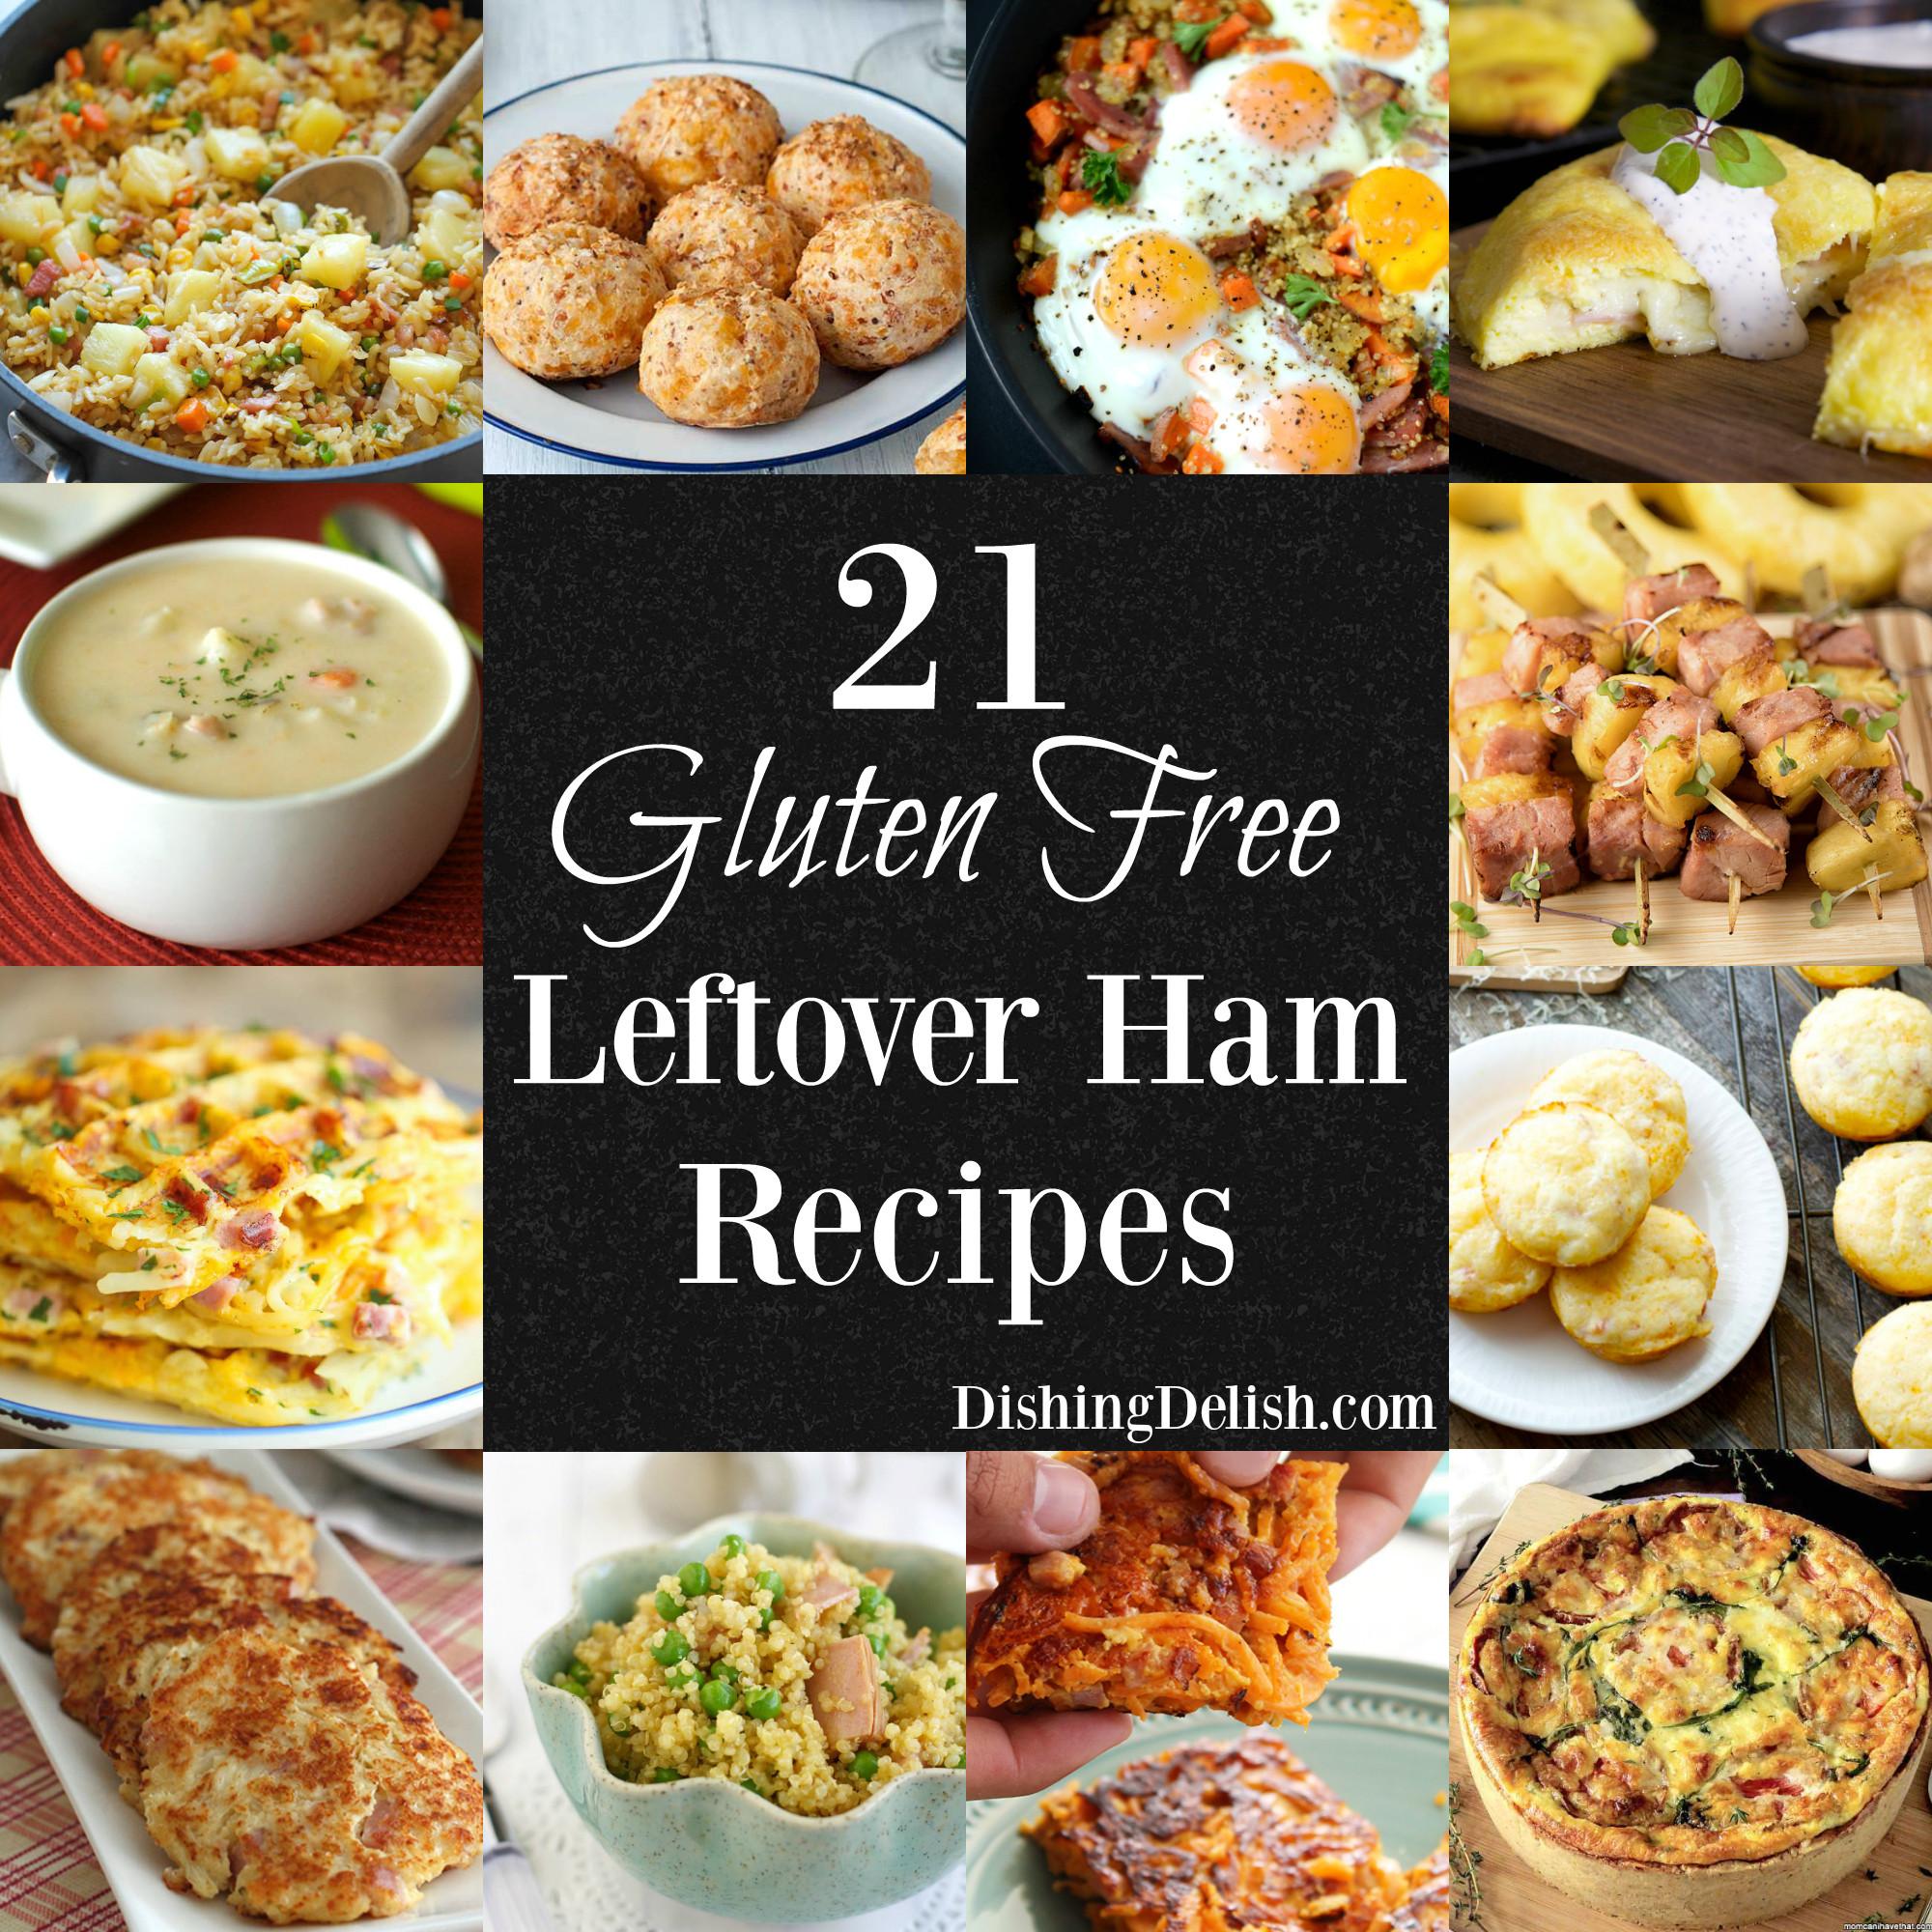 Ww Gluten Free Recipes  21 Gluten Free Leftover Ham Recipes Dishing Delish